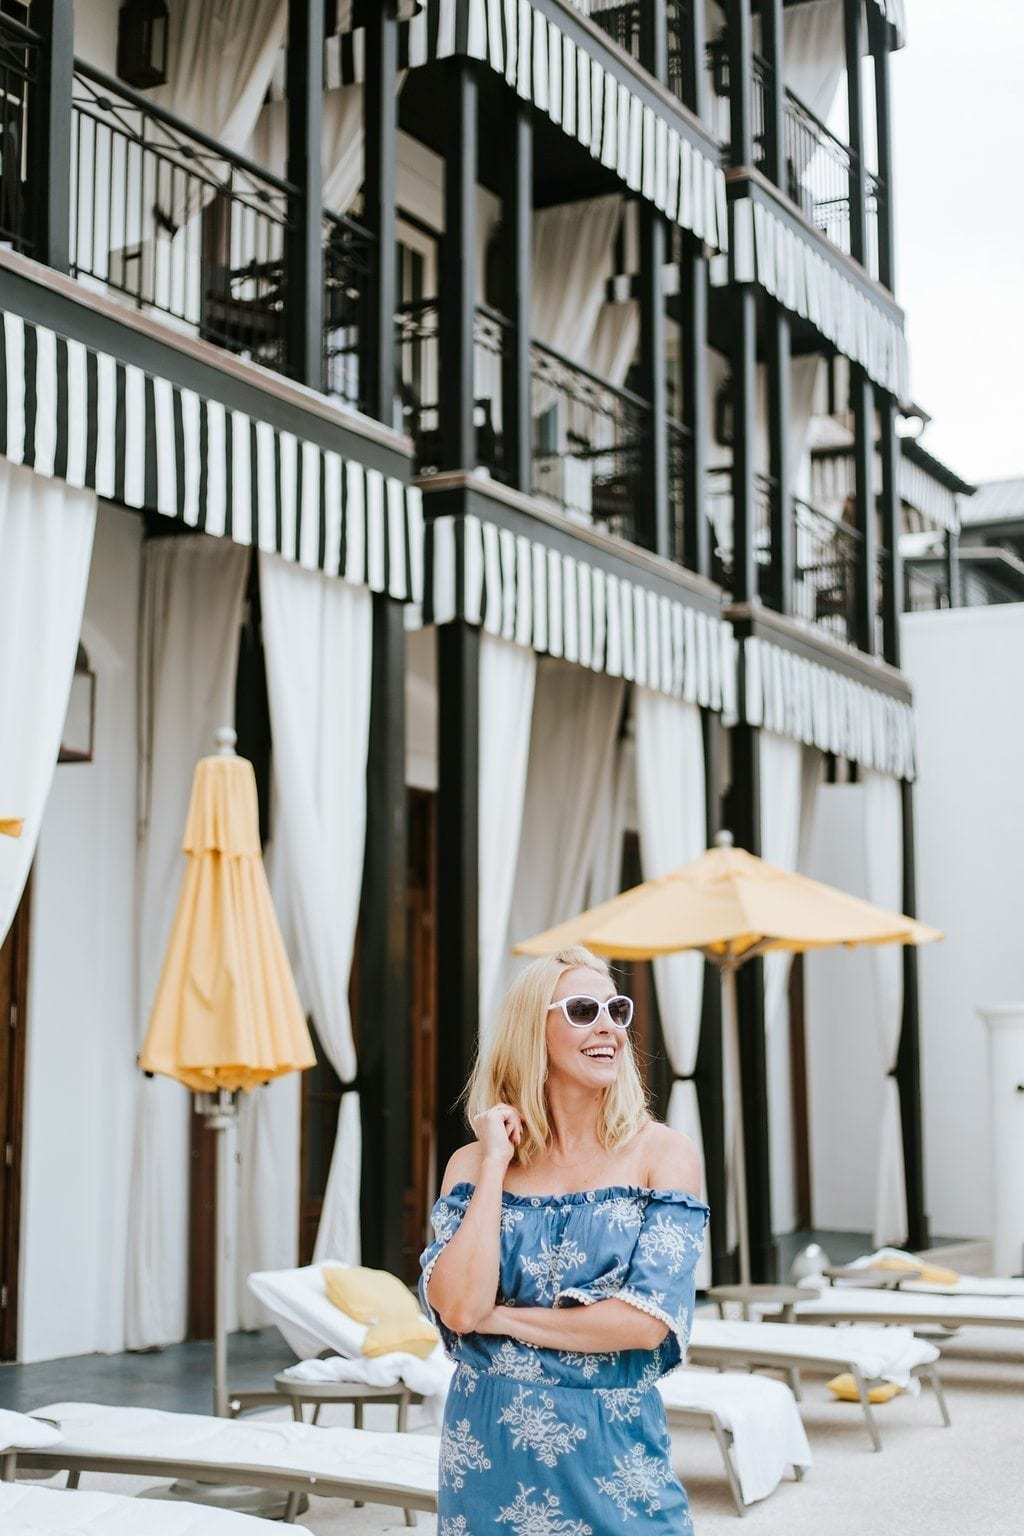 Summer style blue dress at Rosemary Beach hotel.